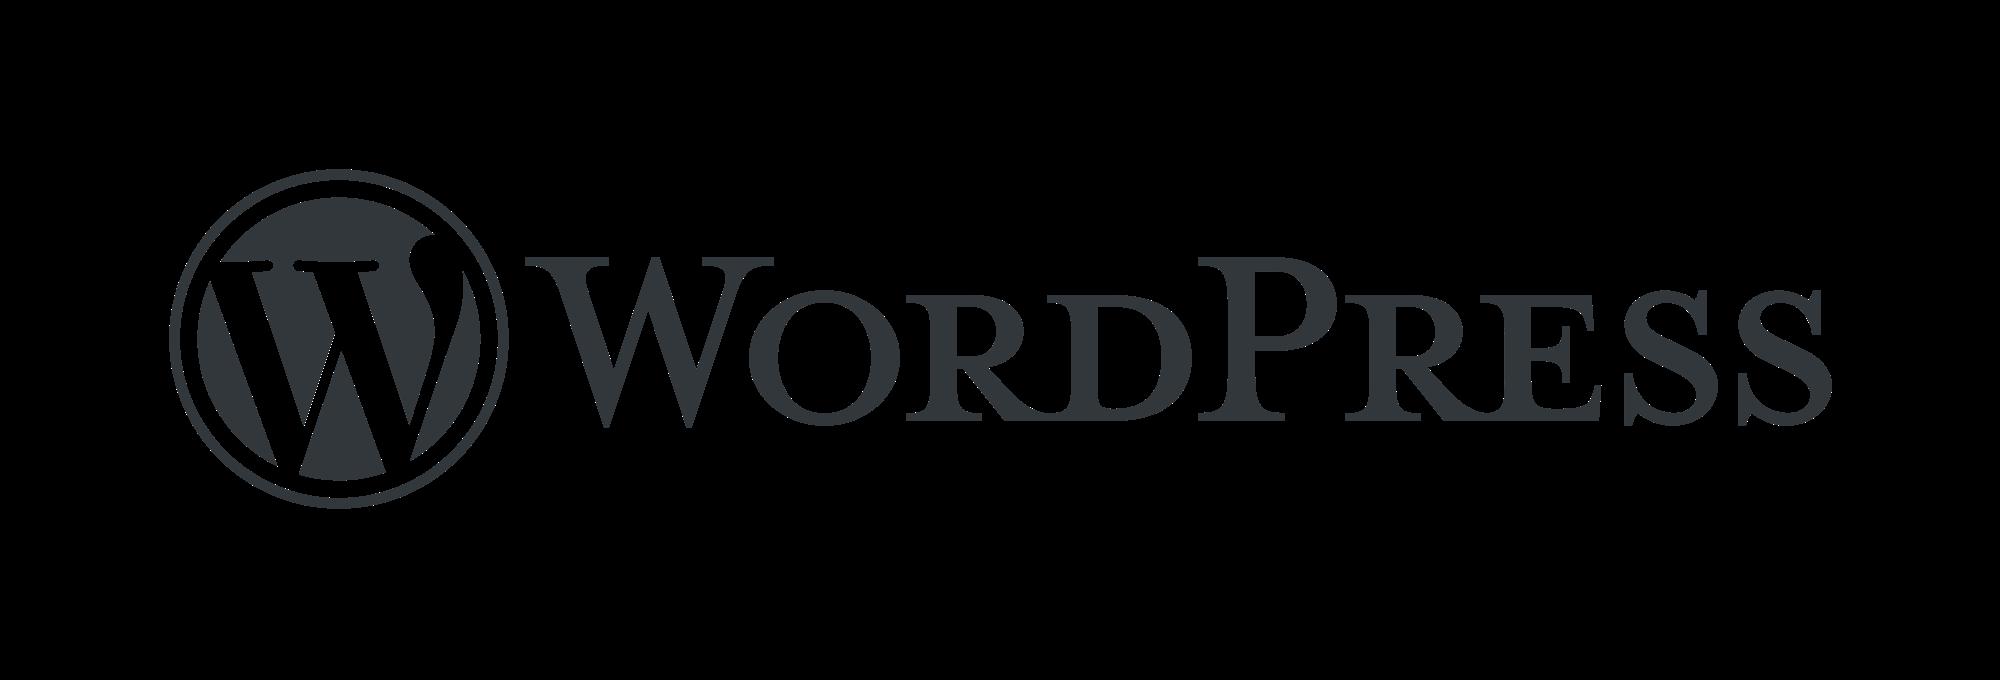 Wordpress as a platform for website design